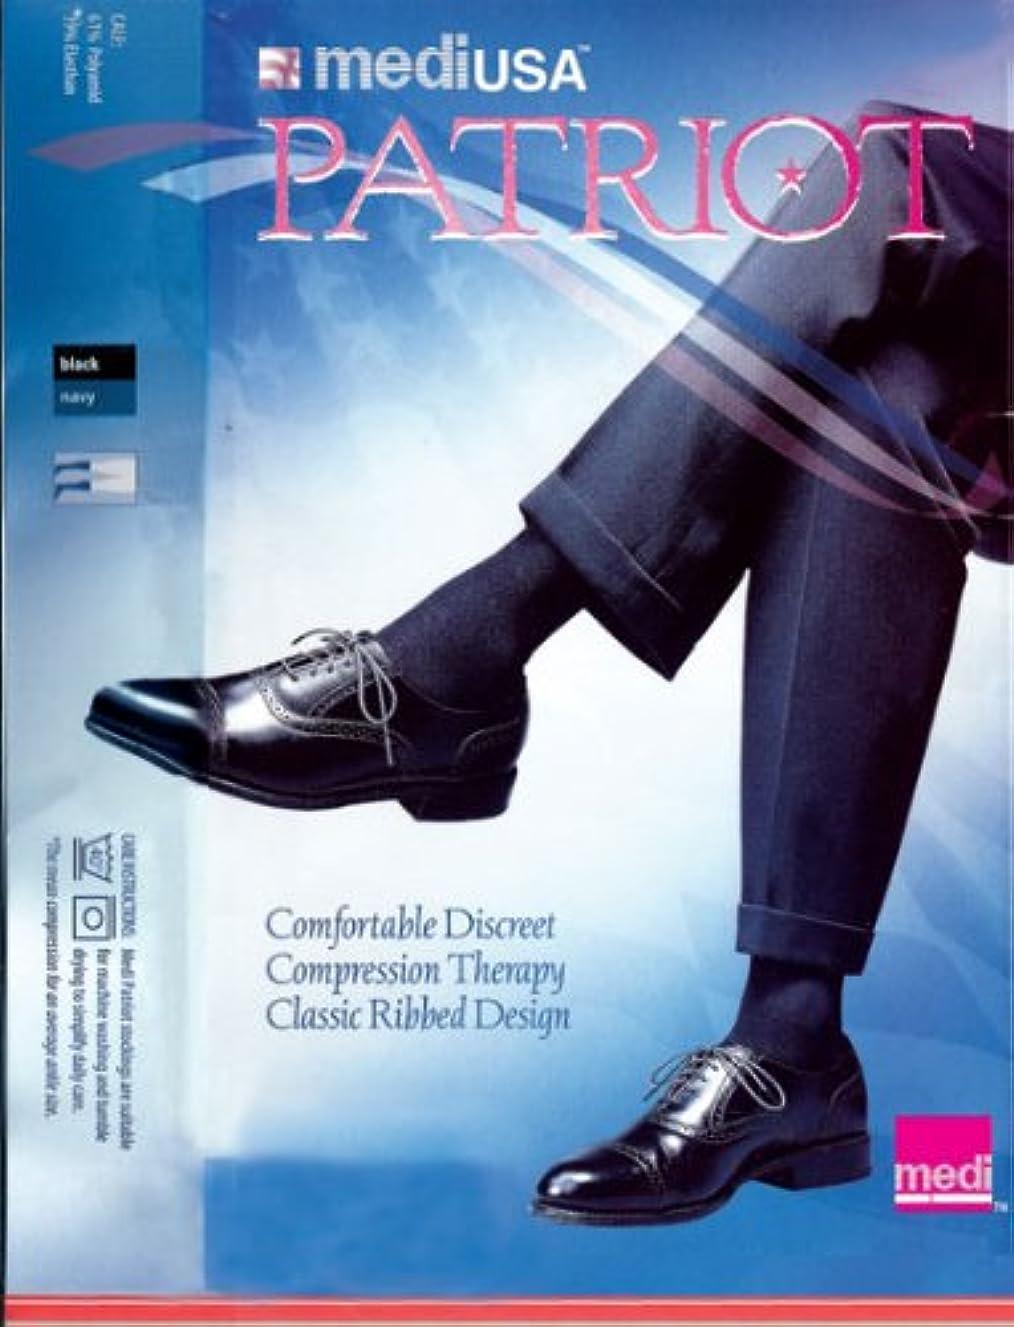 薬行う子供時代Patriot by Medi Ribbed Knee High 20-30mmHg Closed Toe, XL, Navy by Medi